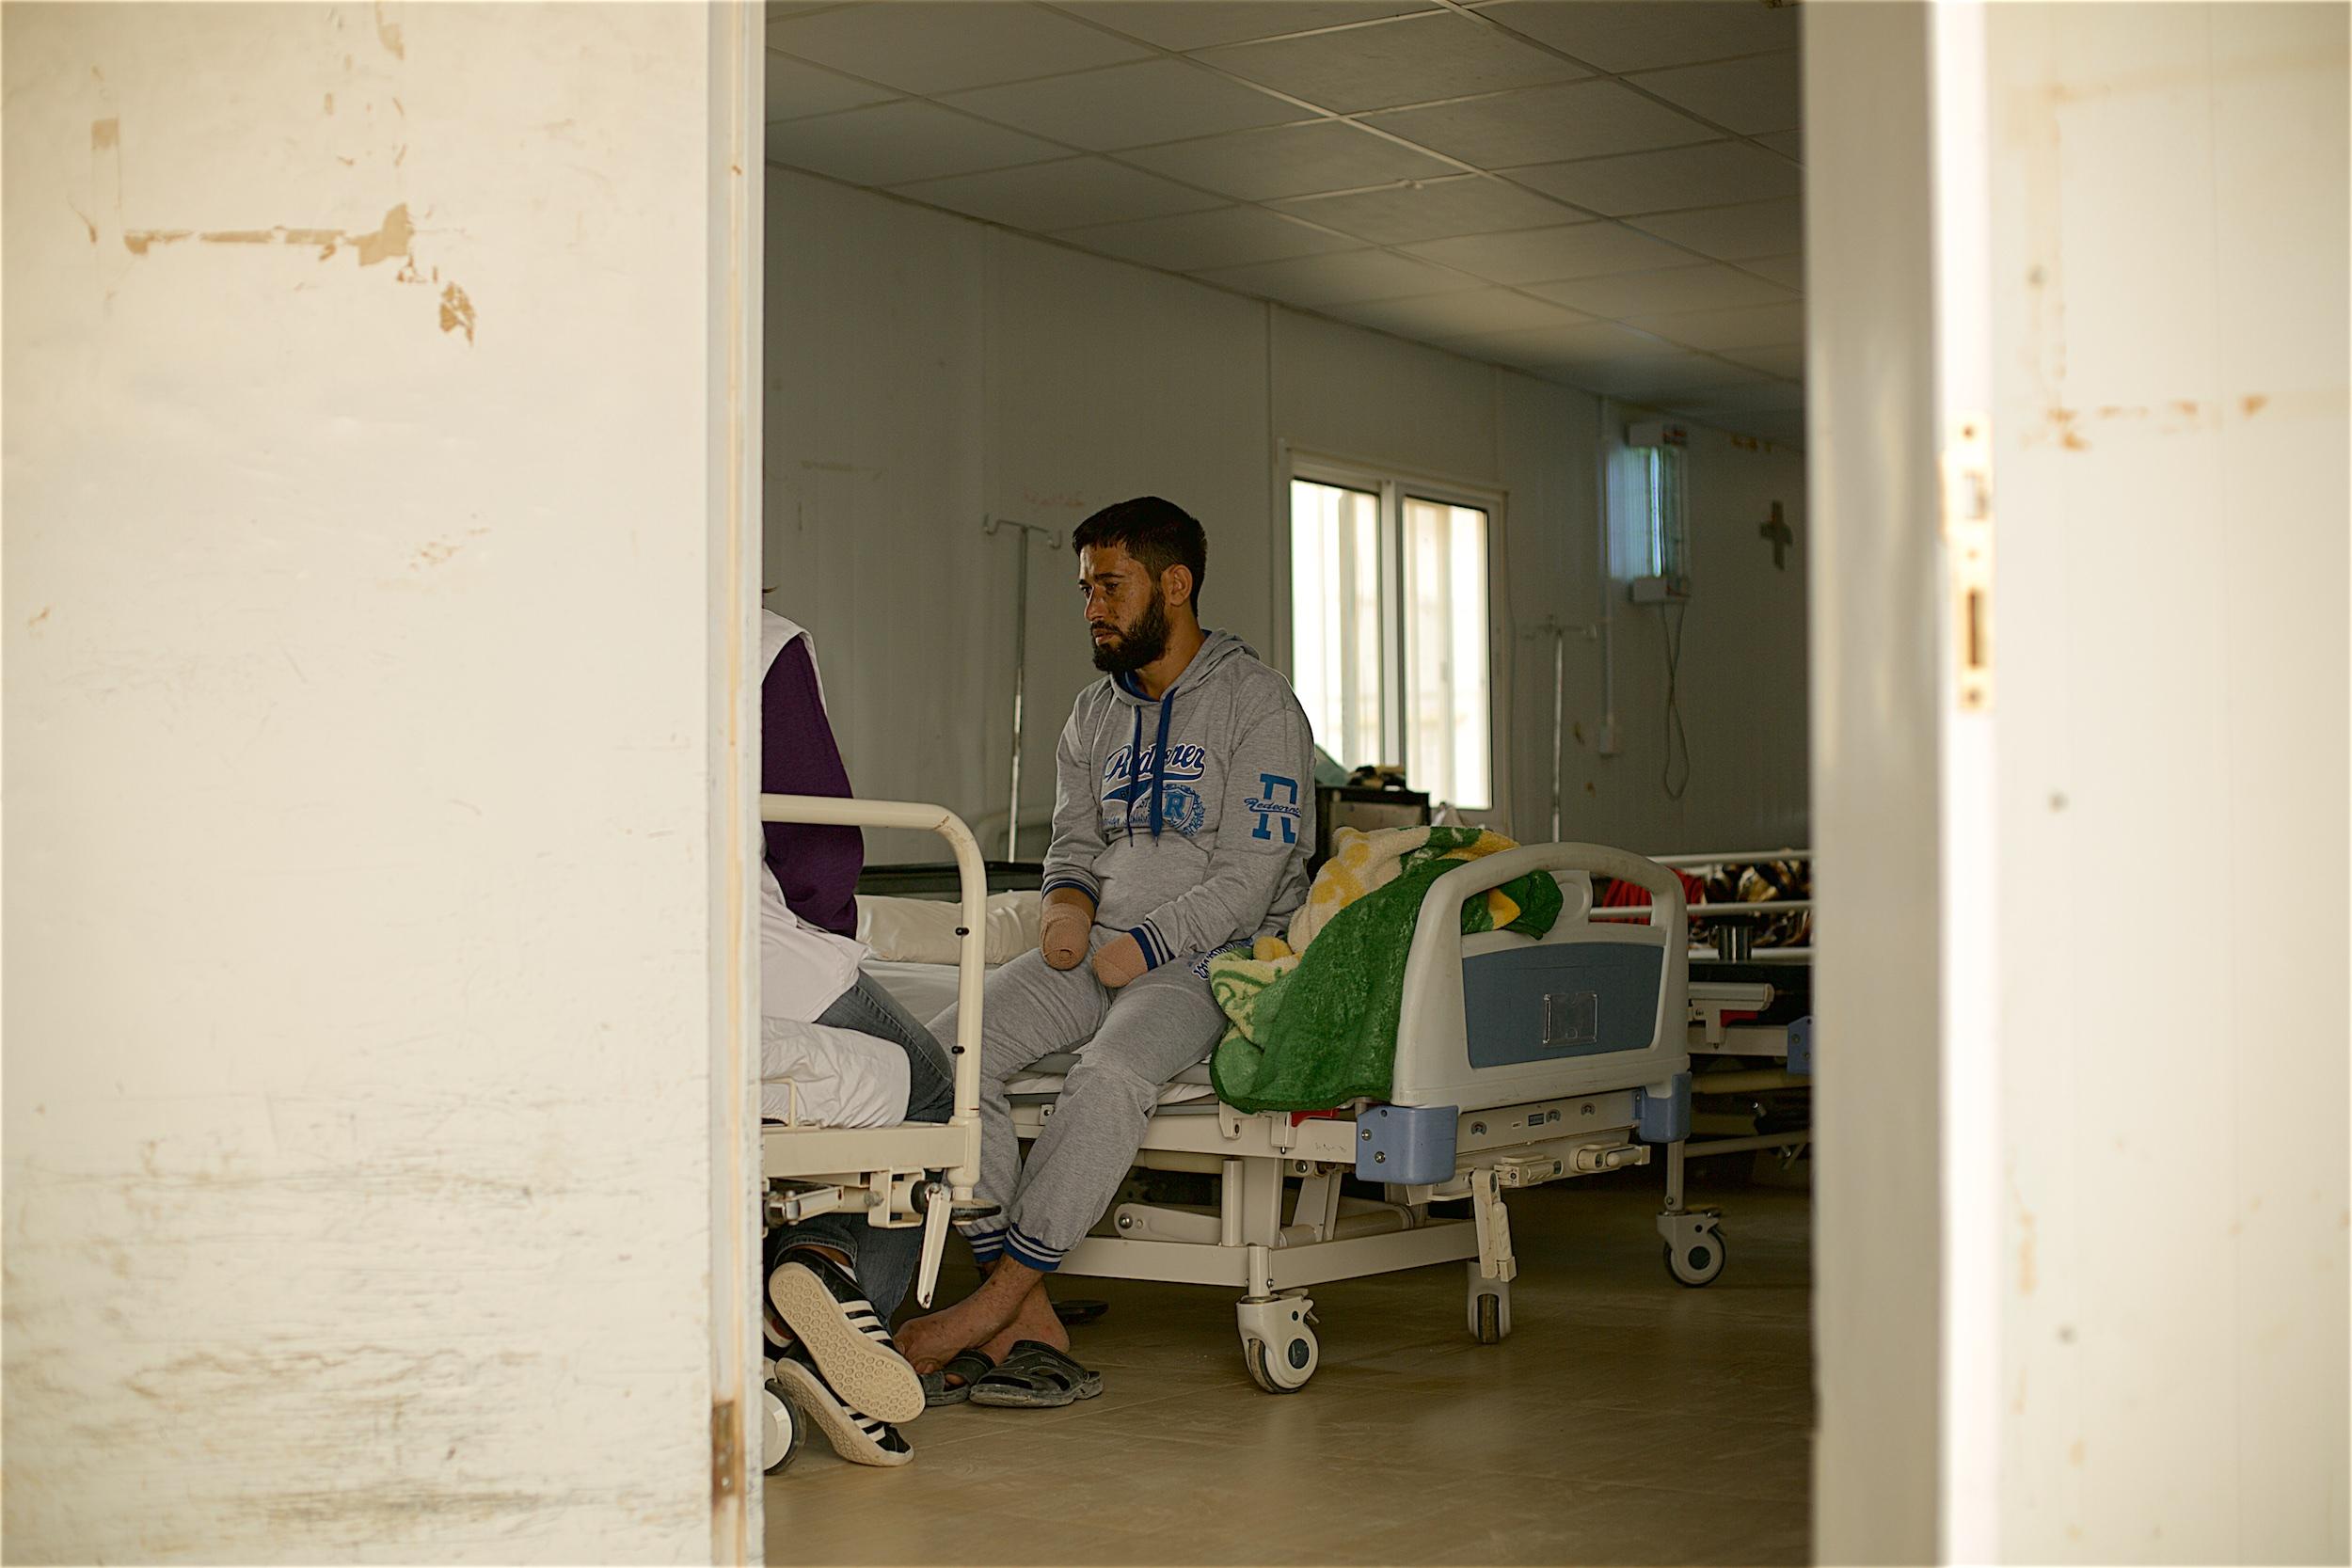 jordan-msf-zaatari-dectors-without-borders-war-hospital-refugee-camp-denis-bosnic-14.jpg